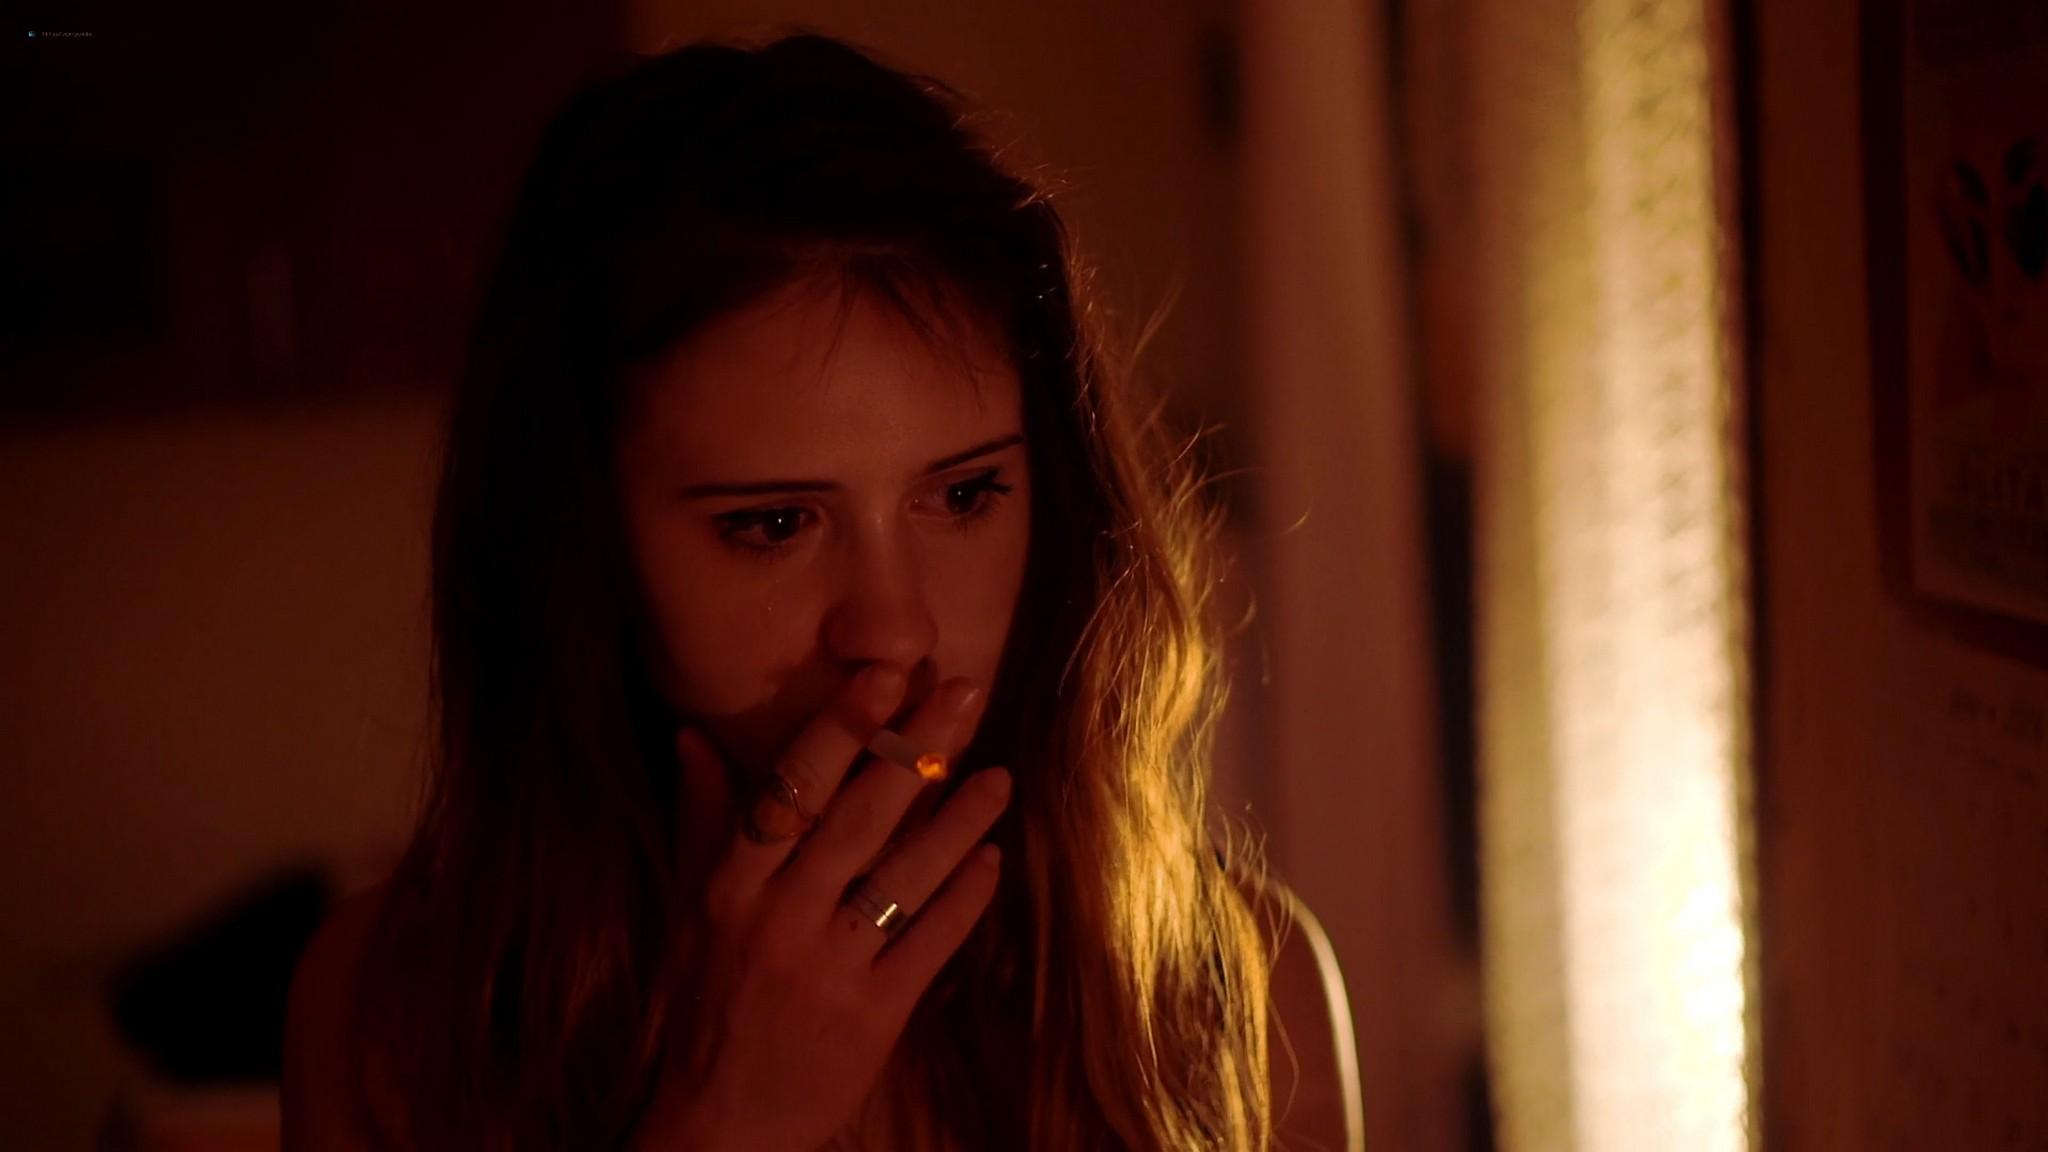 Maria Bakalova nude sex Yoanna Izabella Varbanova nude sex too Transgression BG 2018 HD 1080p Web 002